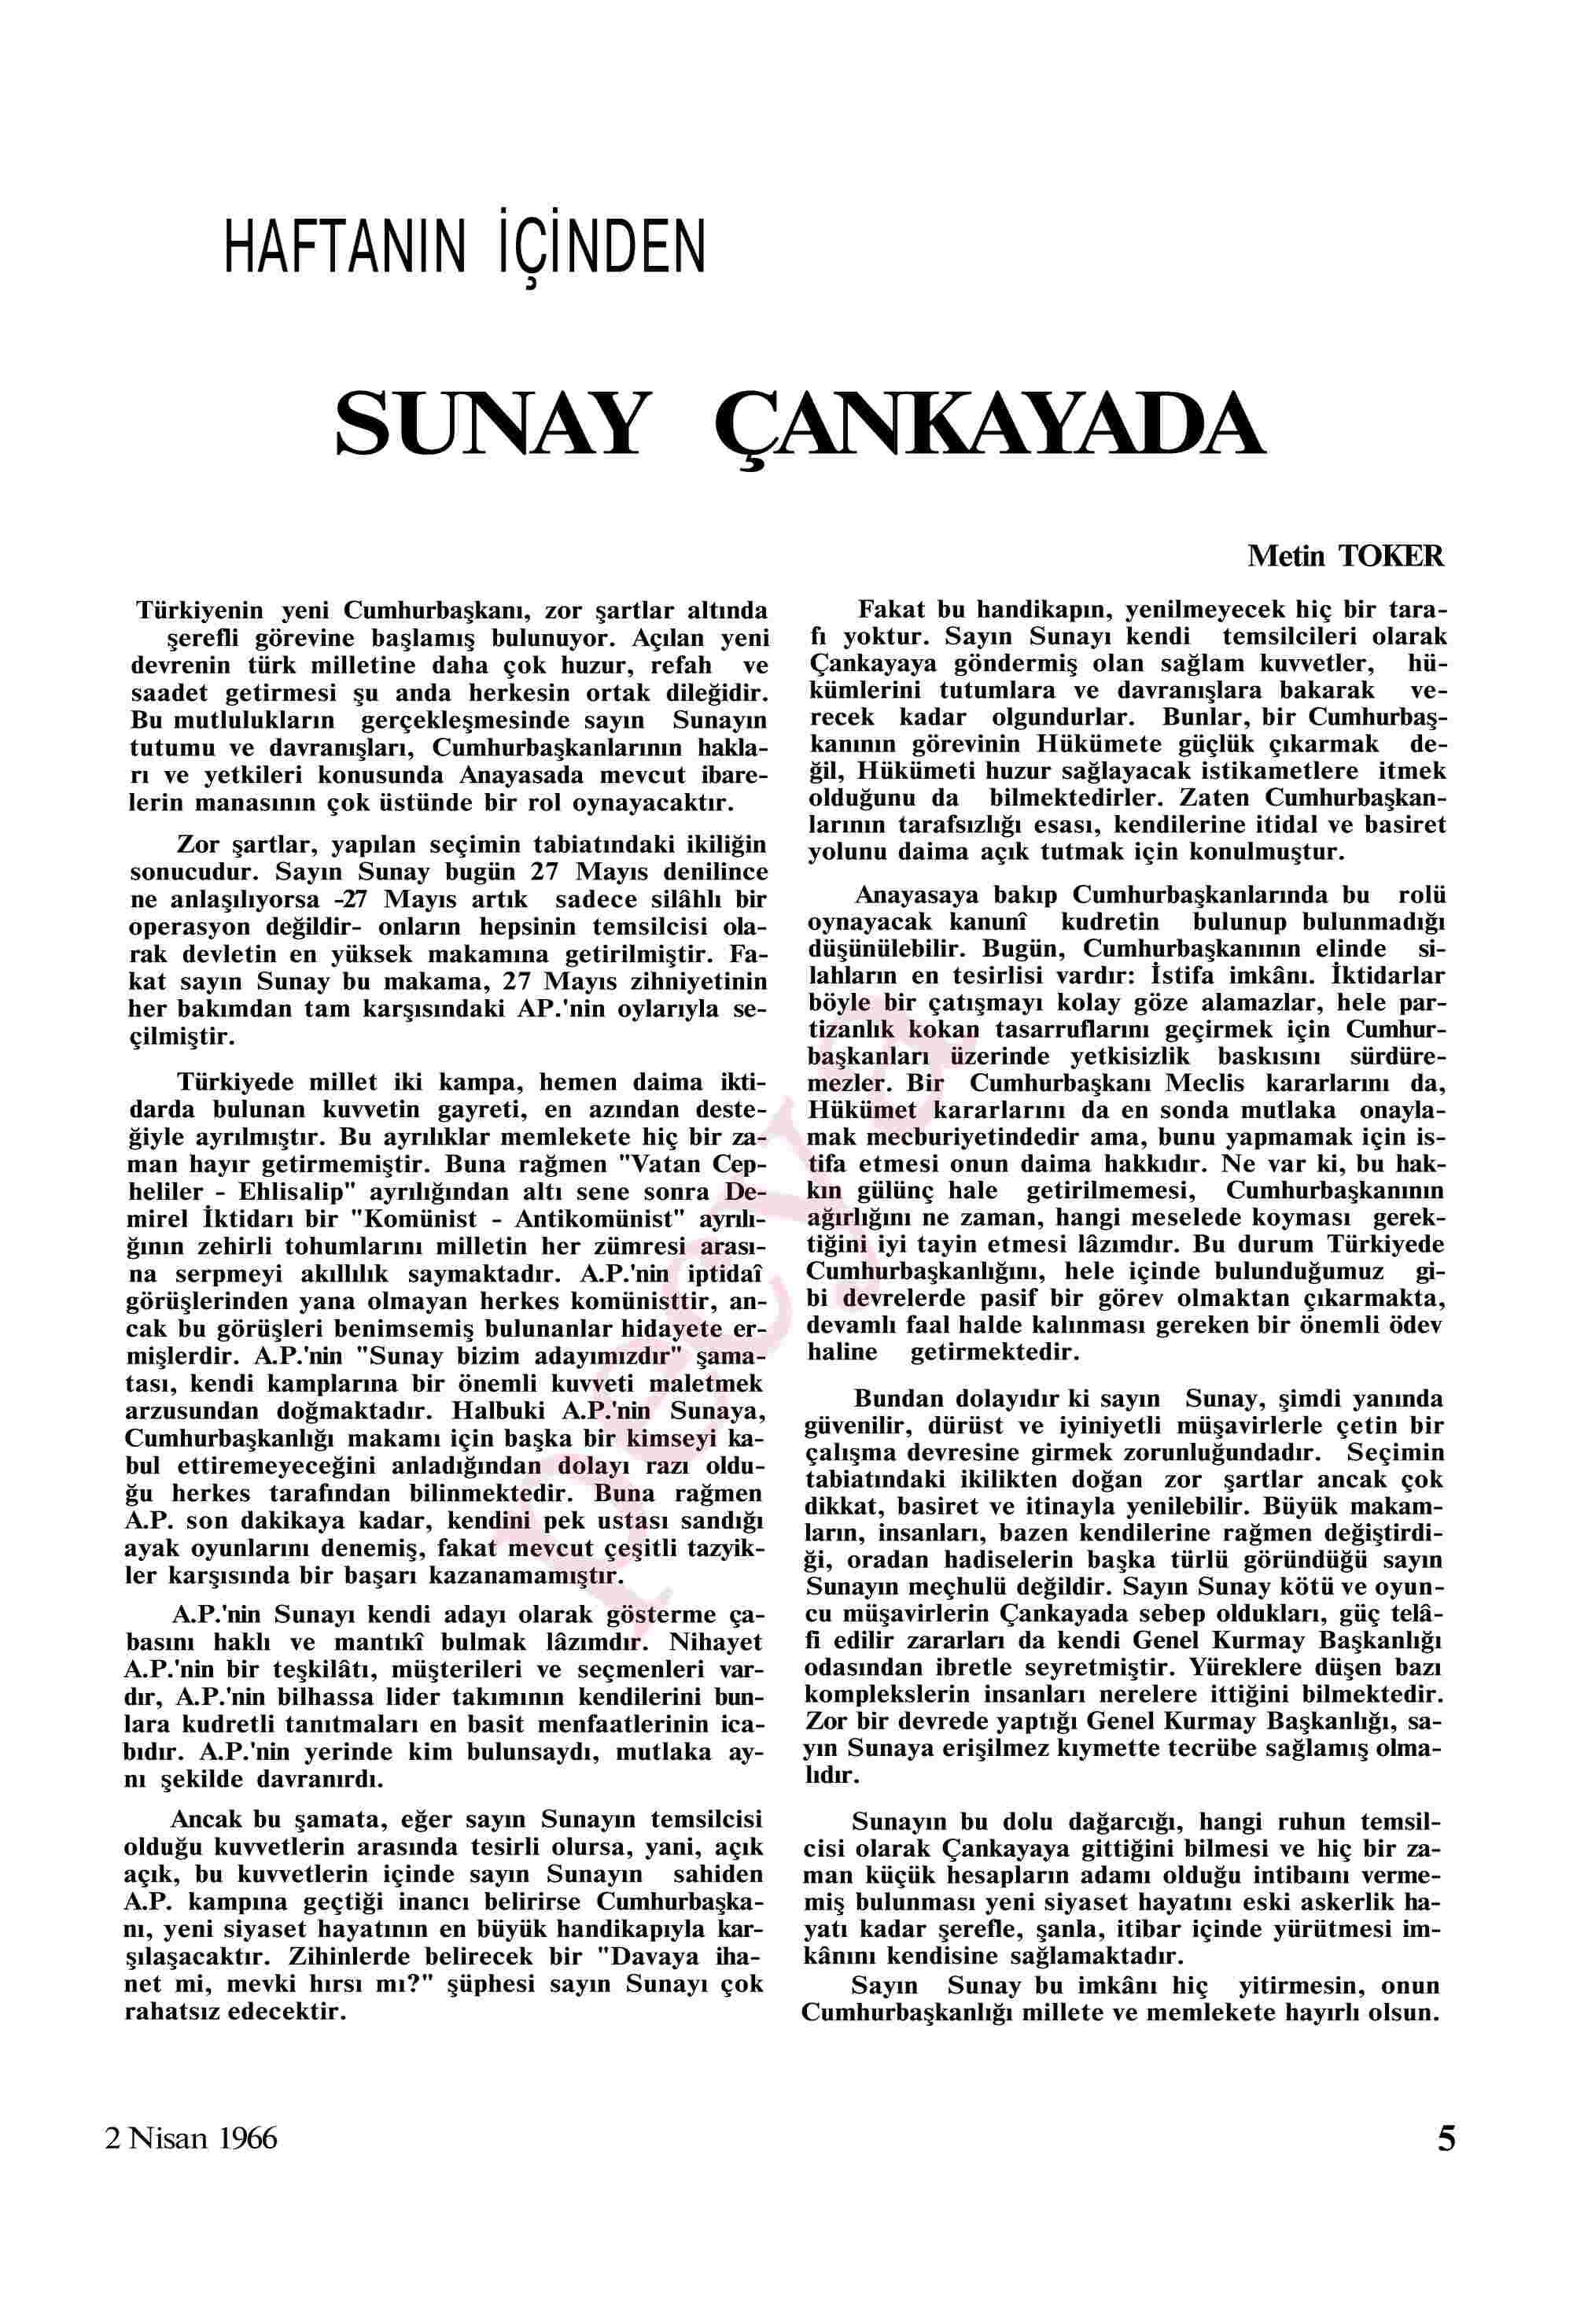 2 Nisan 1966 Tarihli Akis Dergisi Sayfa 5